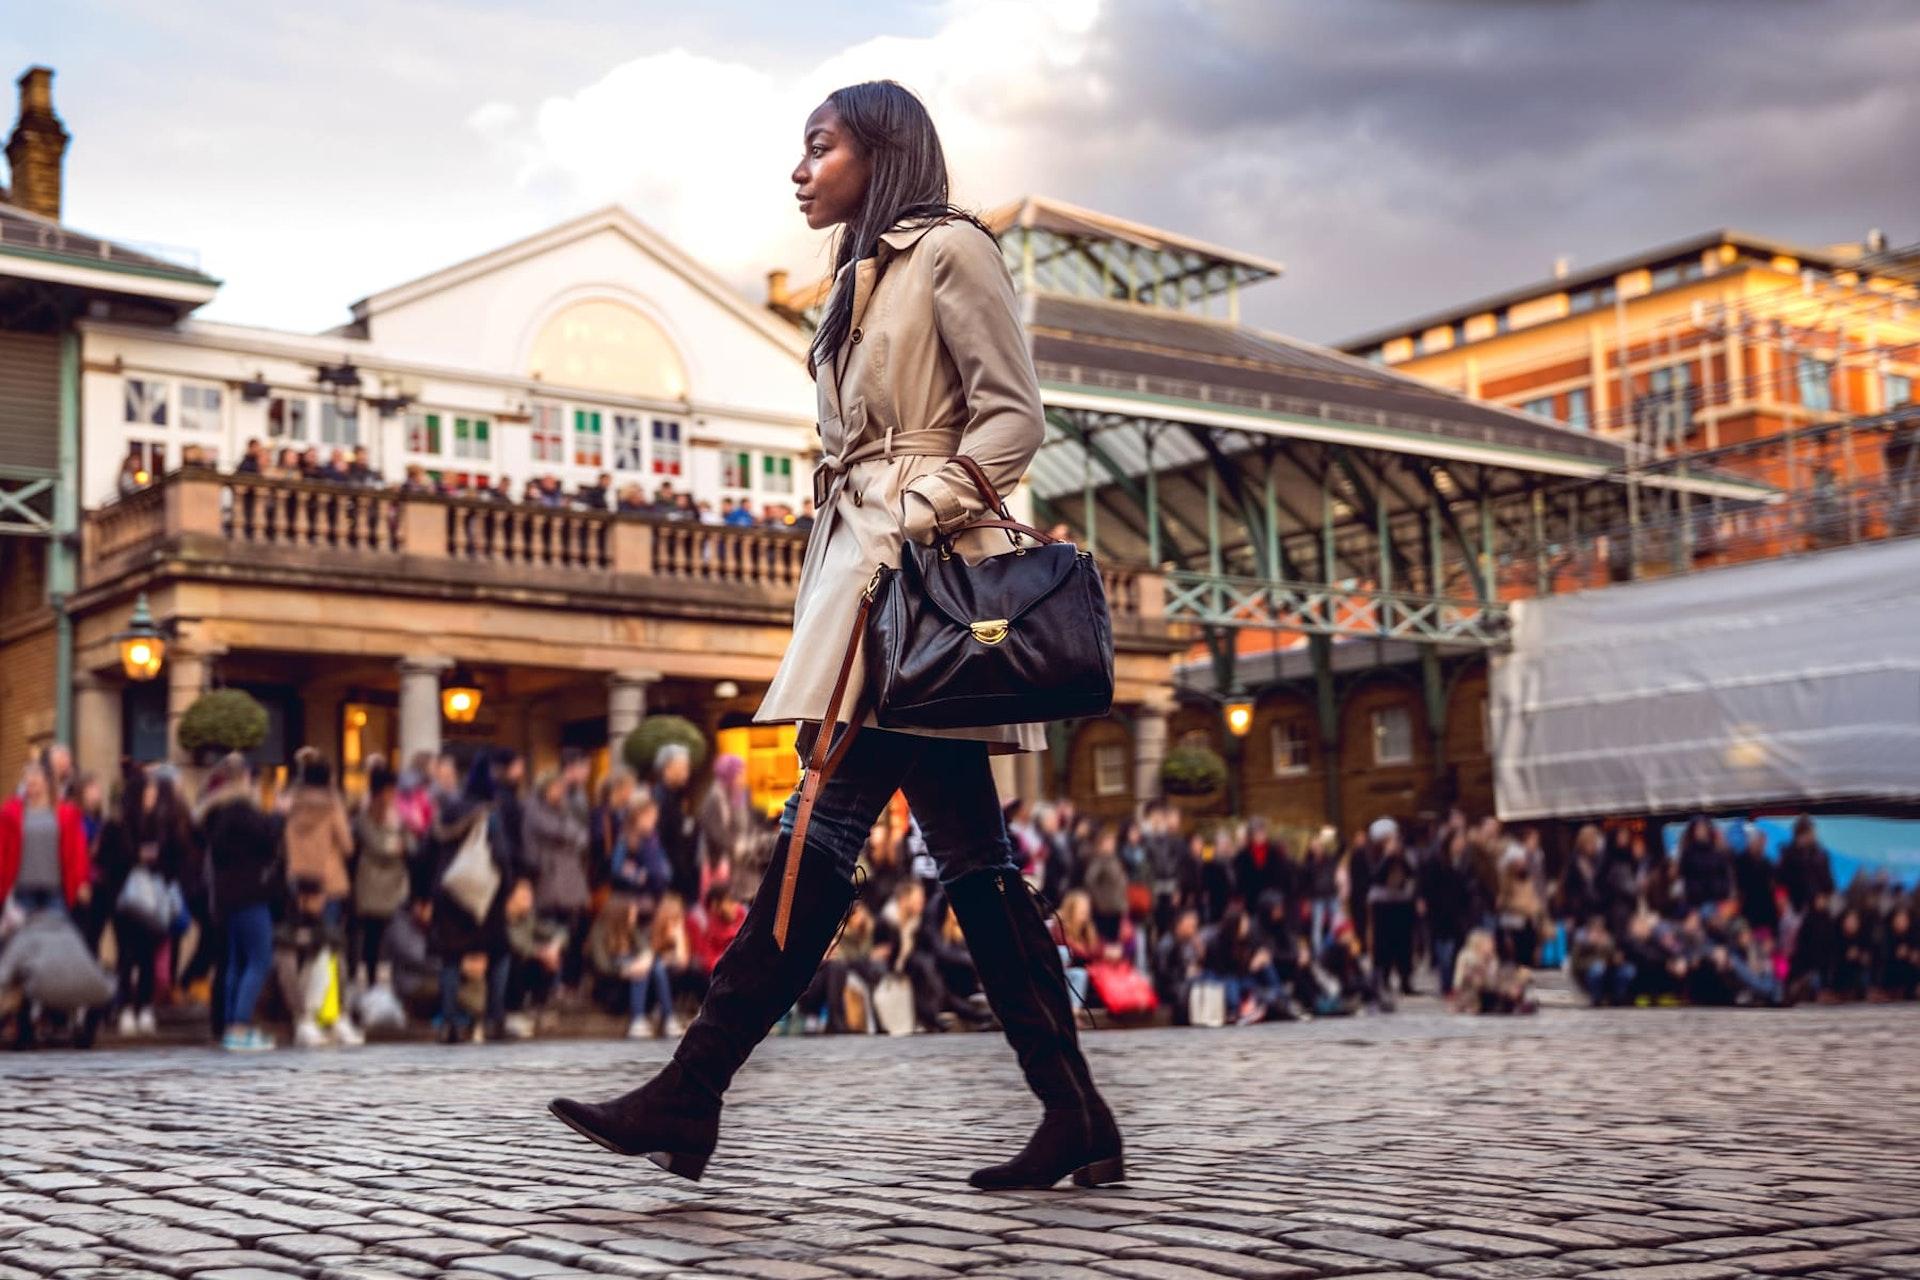 Woman walking past market, London